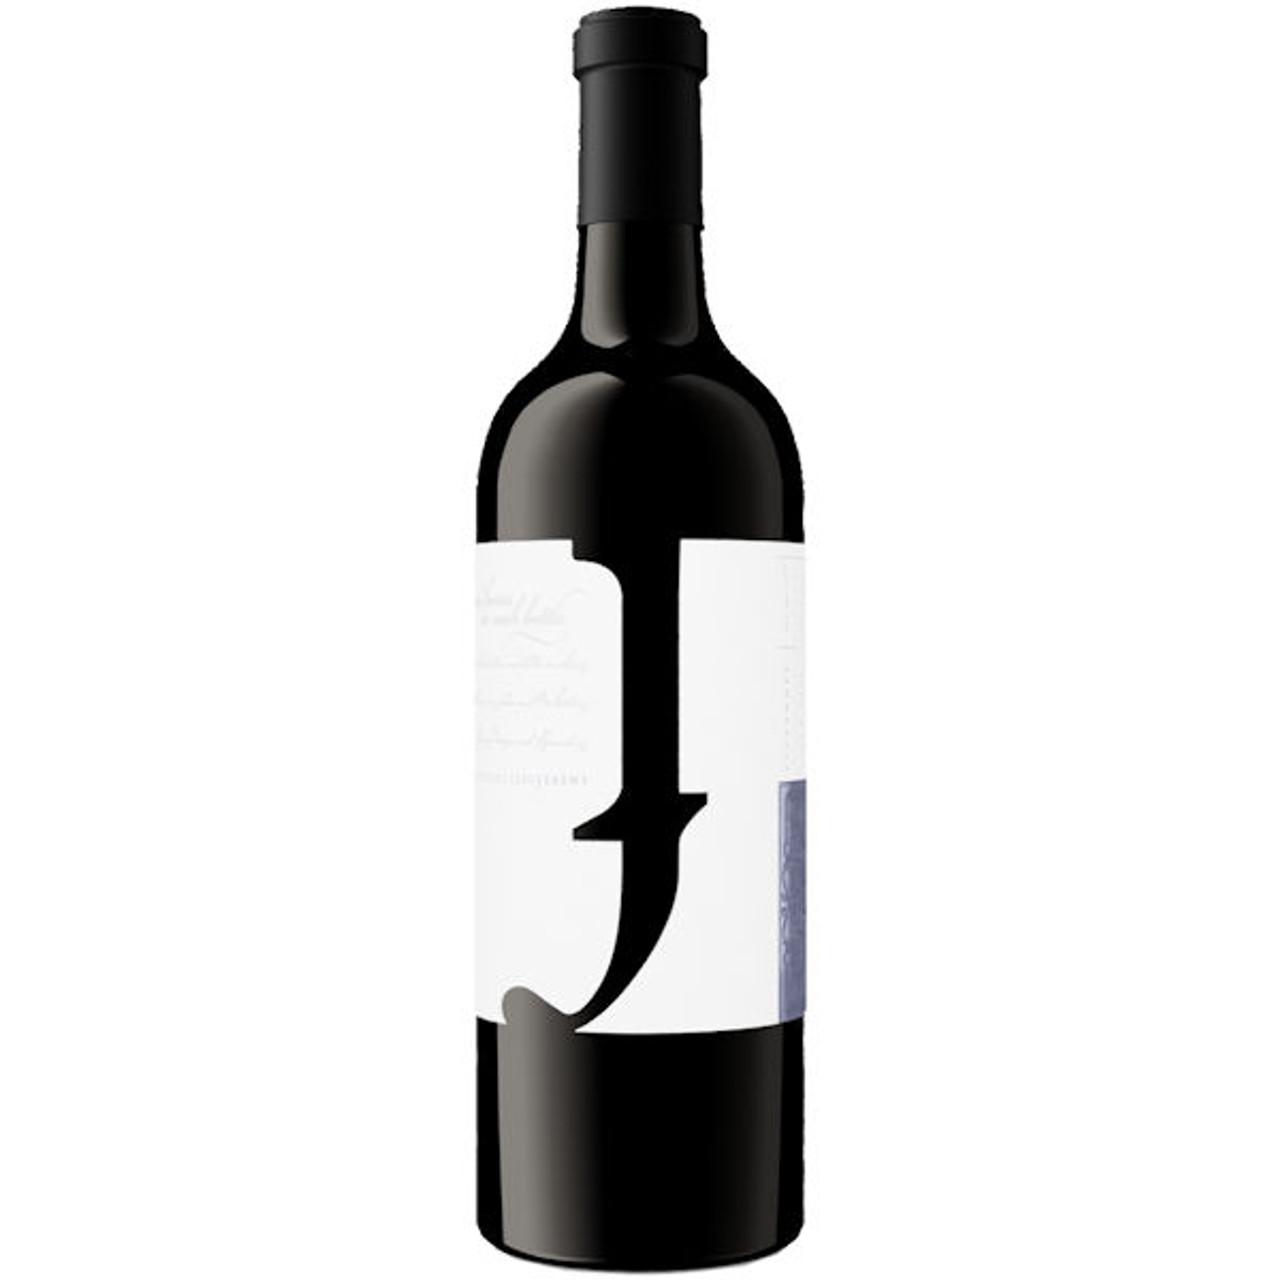 Jeremy Wine Co. Vineyard Cuvee Lodi Old Vine Zinfandel